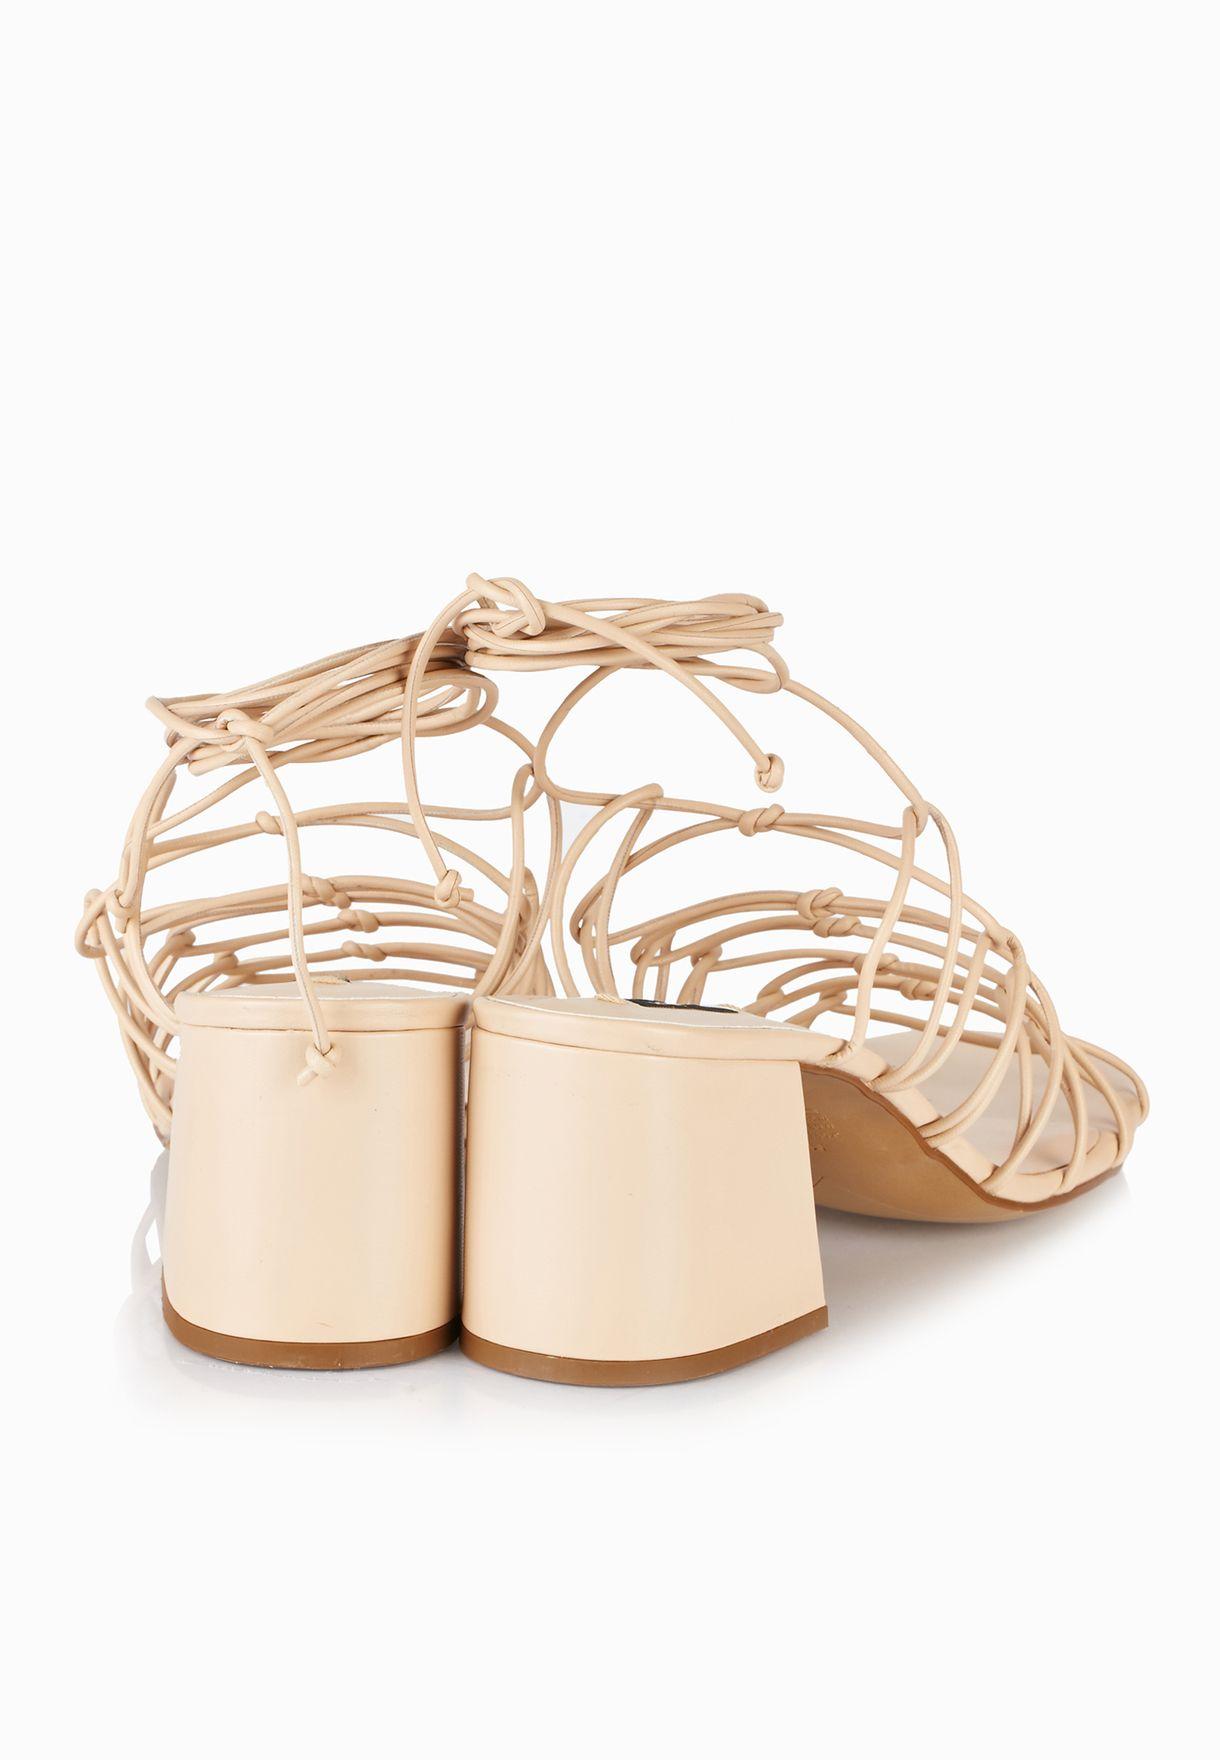 Net Lace up Ghillie Sandals